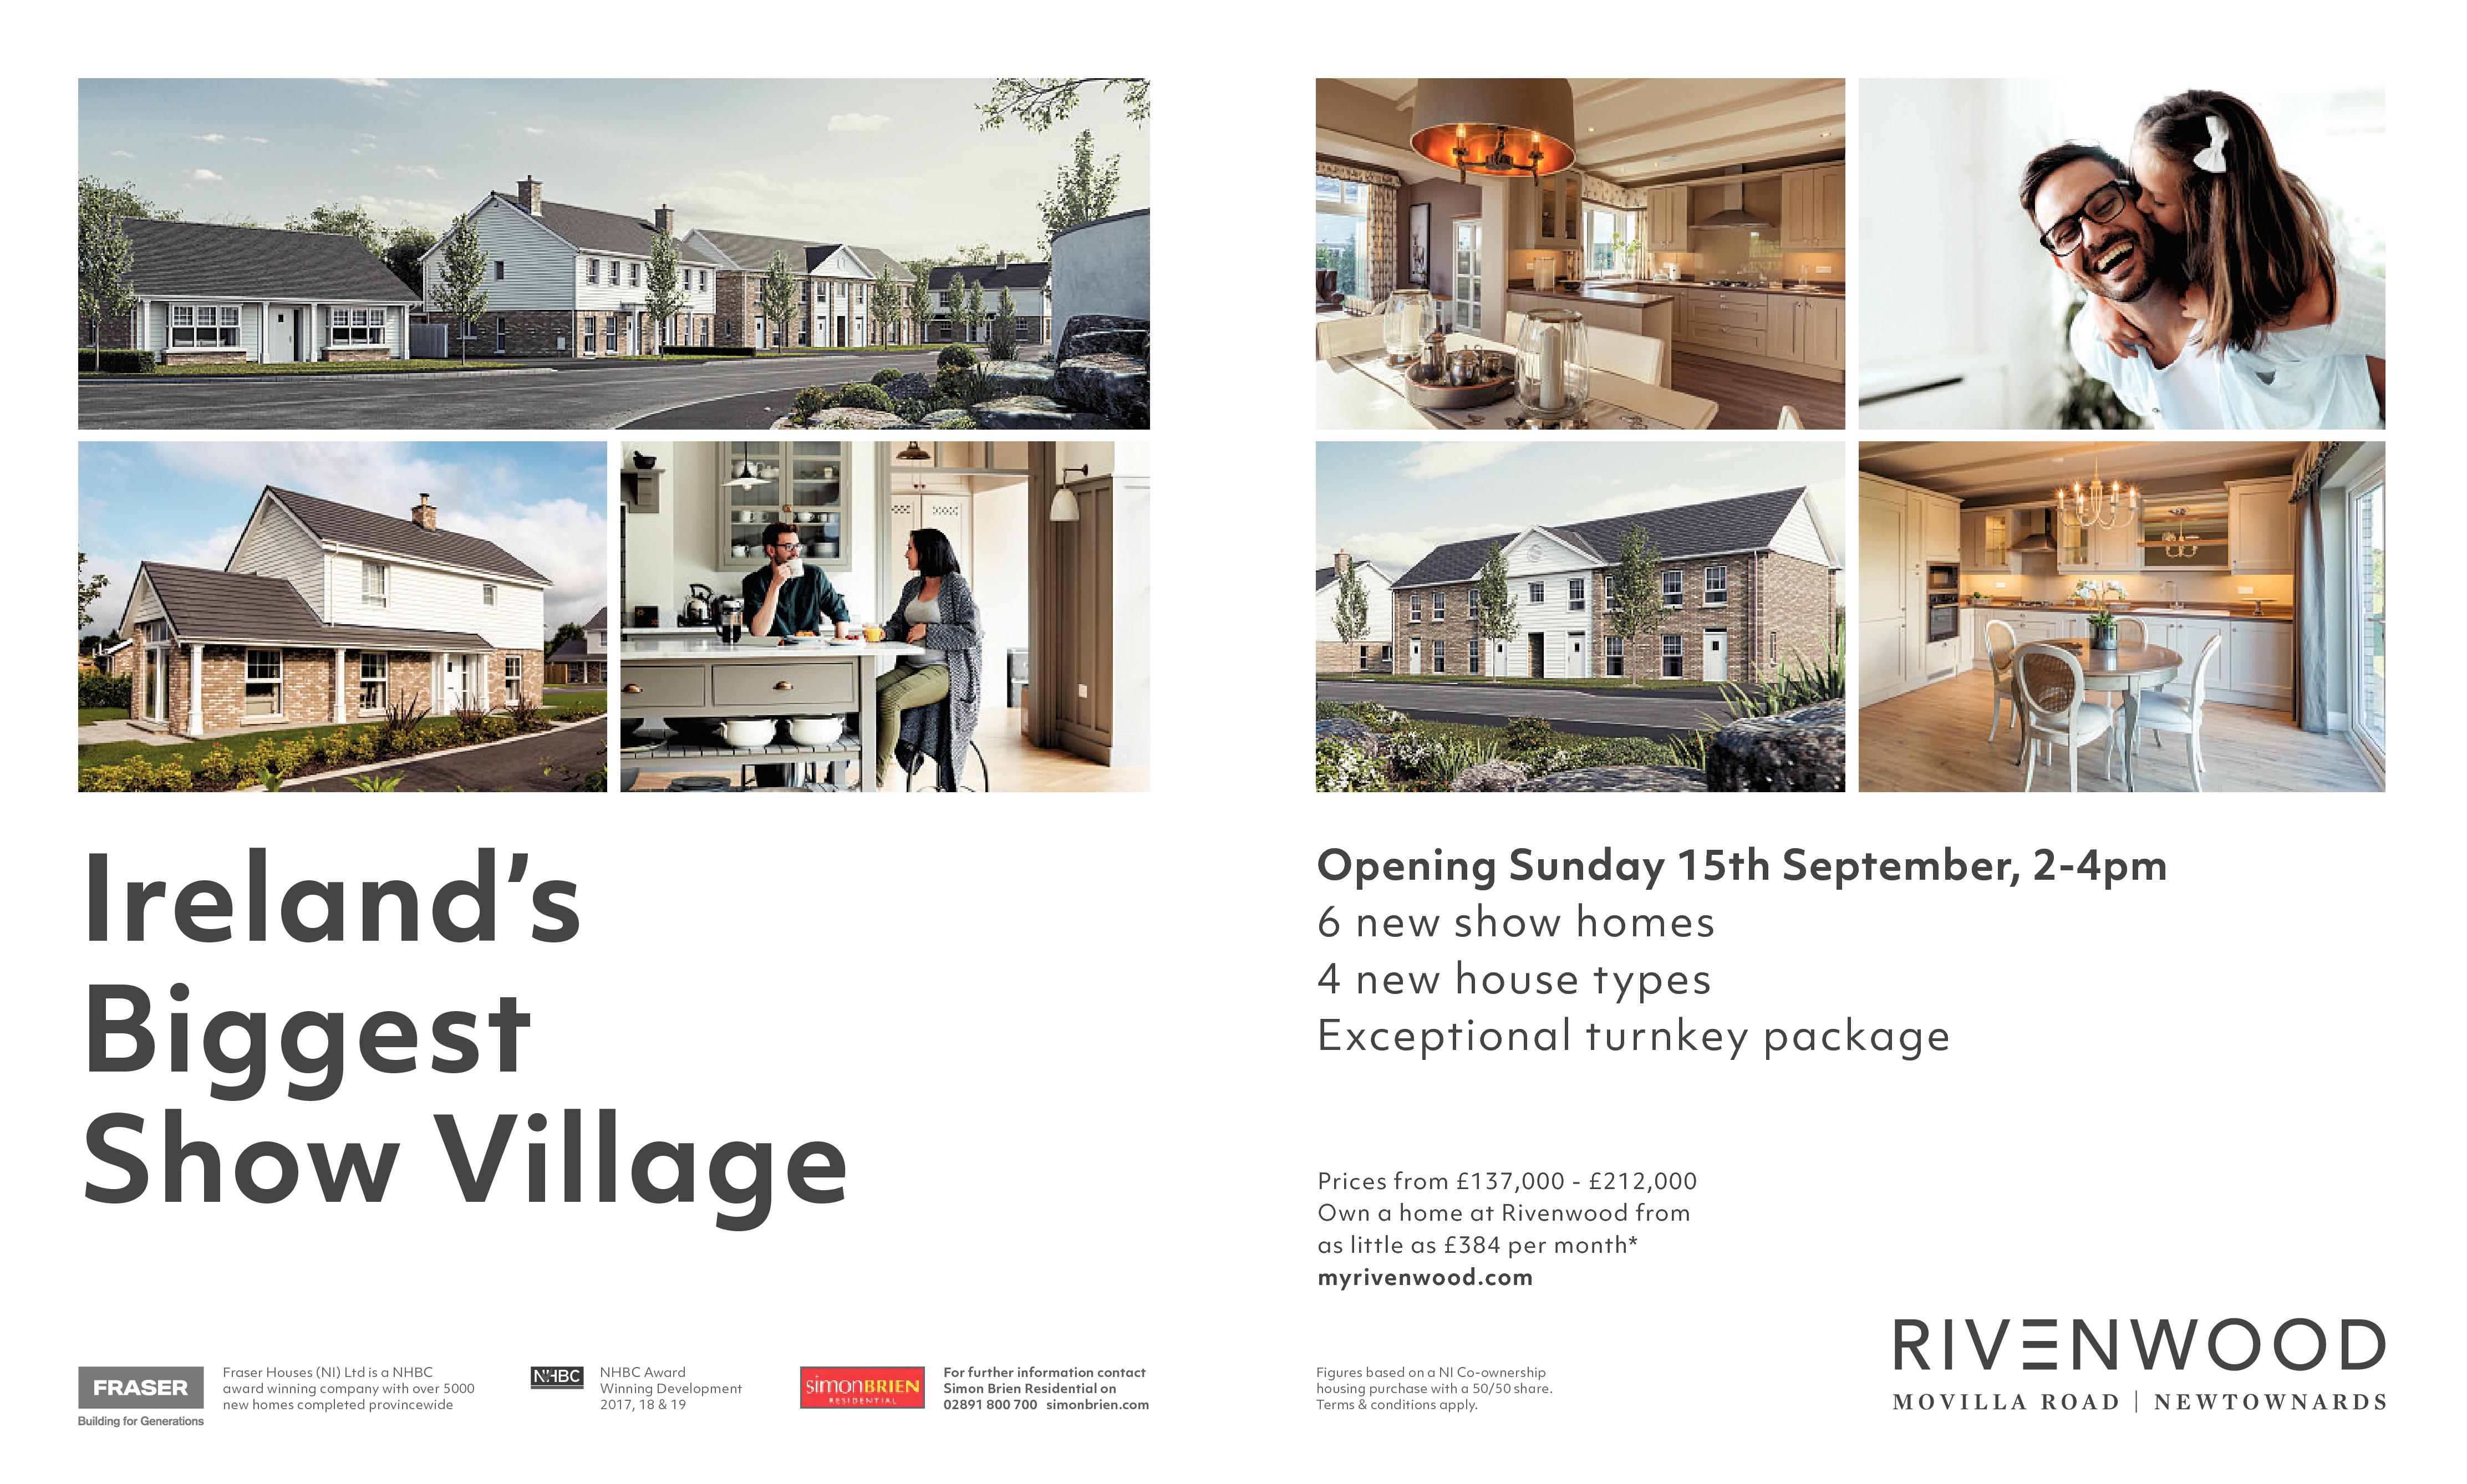 RIVENWOOD - Opening Sunday 15th September